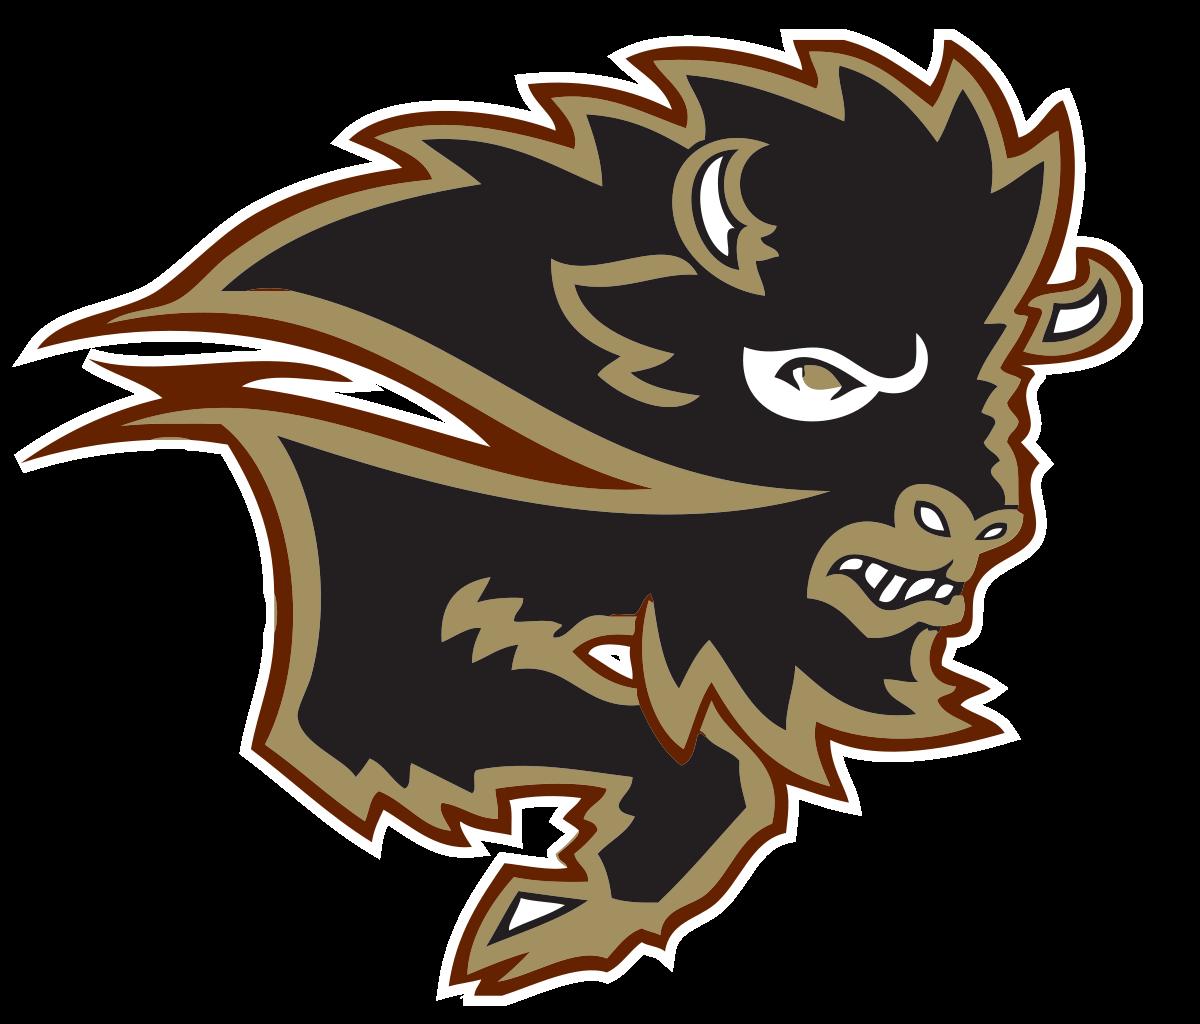 Manitoba bisons wikipedia . Bison clipart mascot